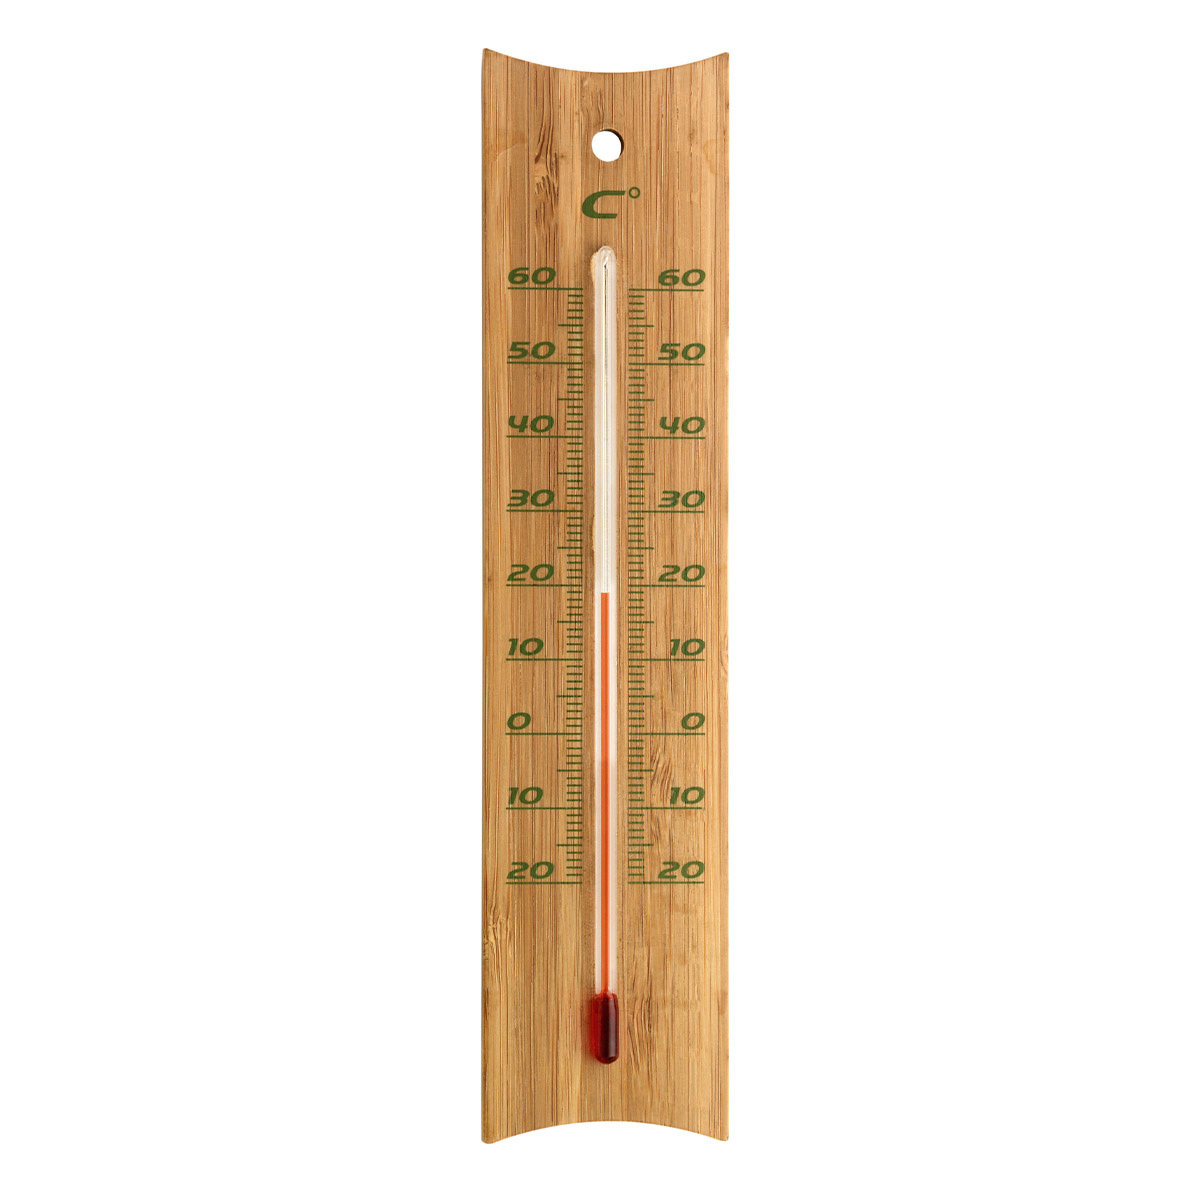 12-1049-analoges-innen-aussen-thermometer-bambus-1200x1200px.jpg